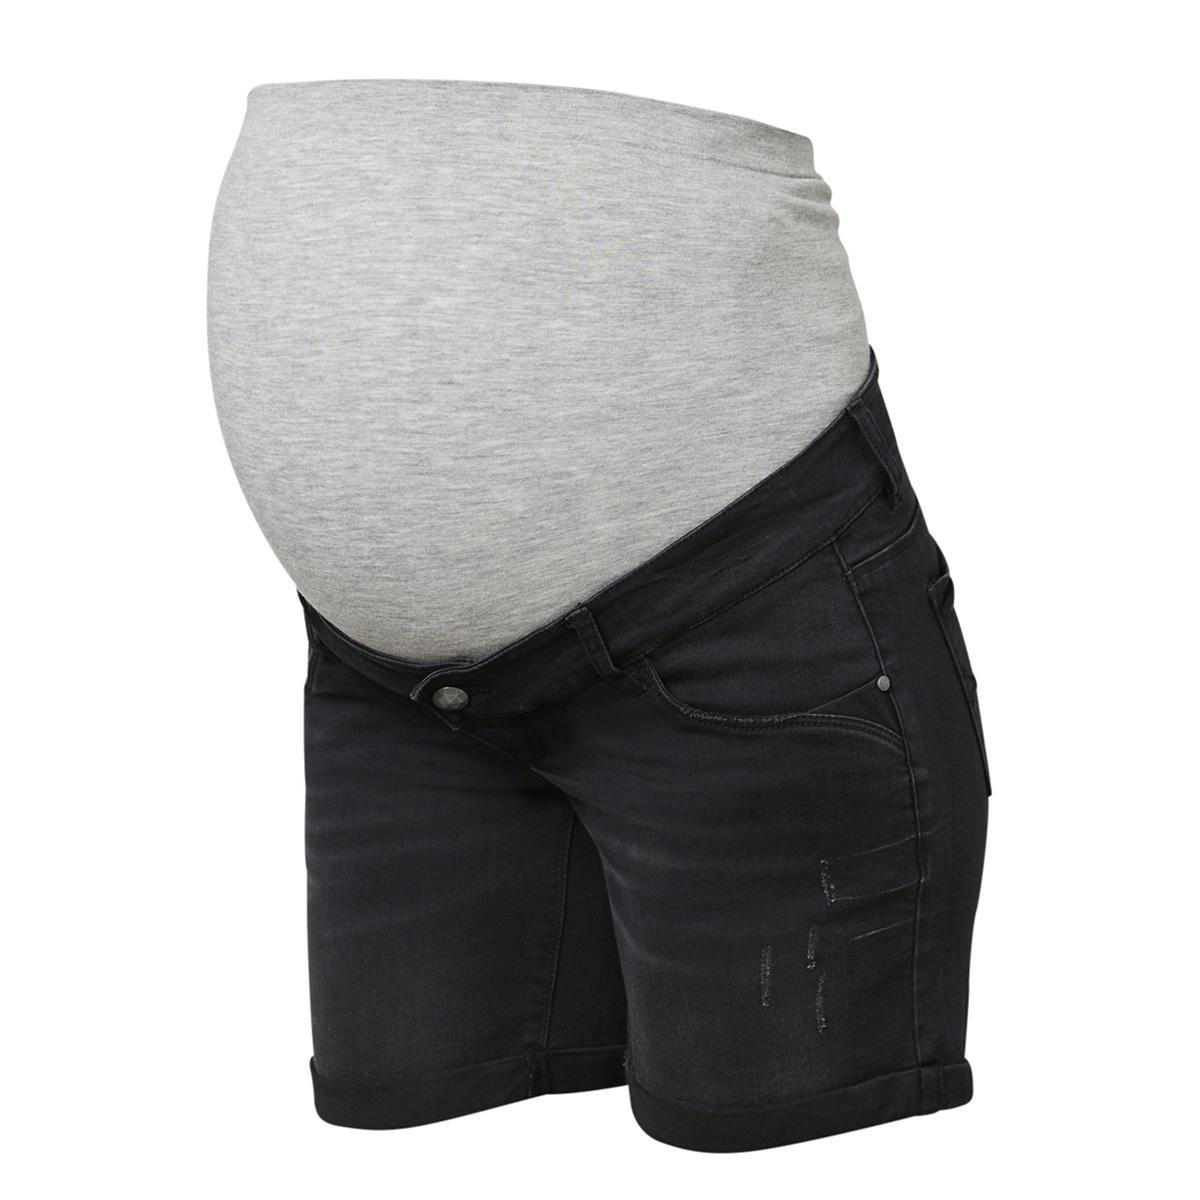 mlpaz slim denim shorts a 20009631 mama-licious positie broek black denim